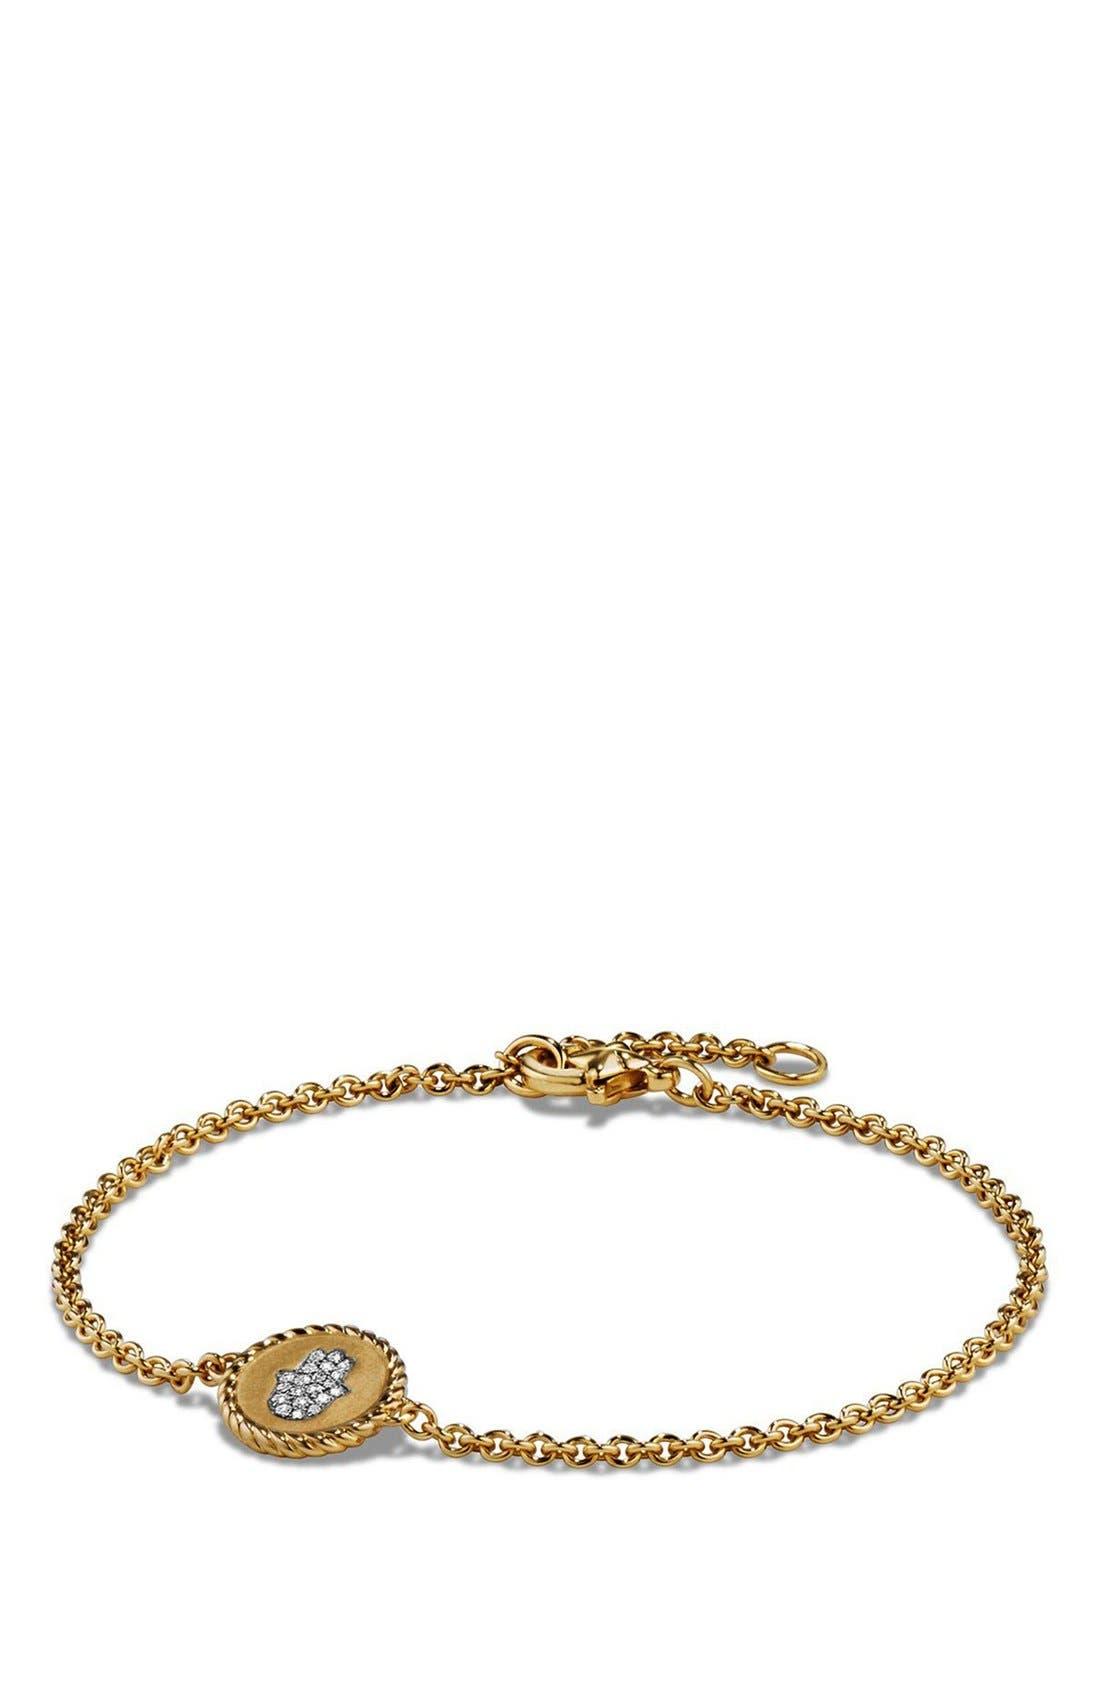 'Petite Pavé' Hamsa Bracelet with Diamonds in 18K Gold,                             Main thumbnail 1, color,                             GOLD